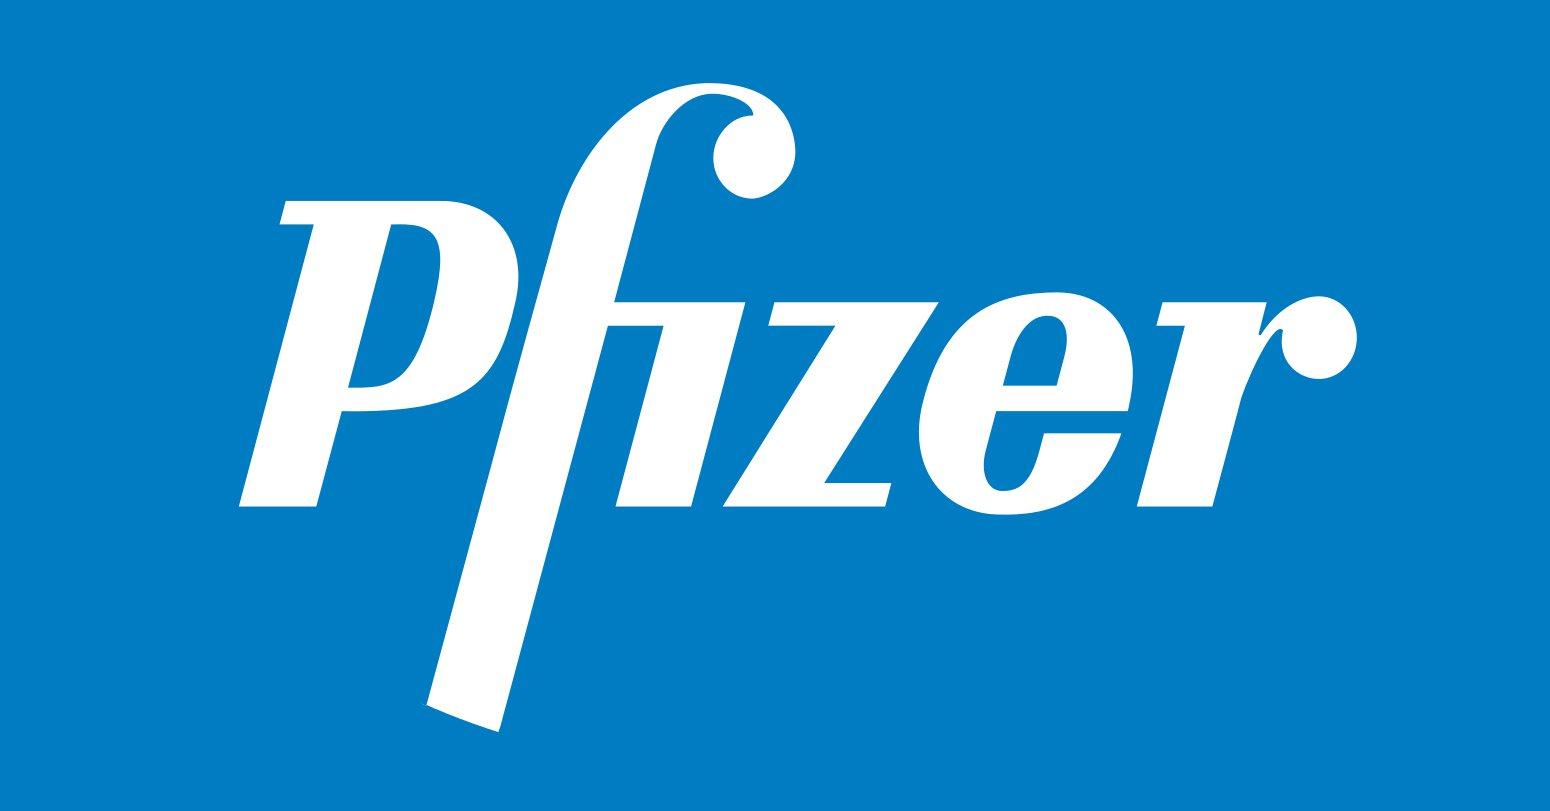 pfizer logo pfizer symbol meaning history and evolution